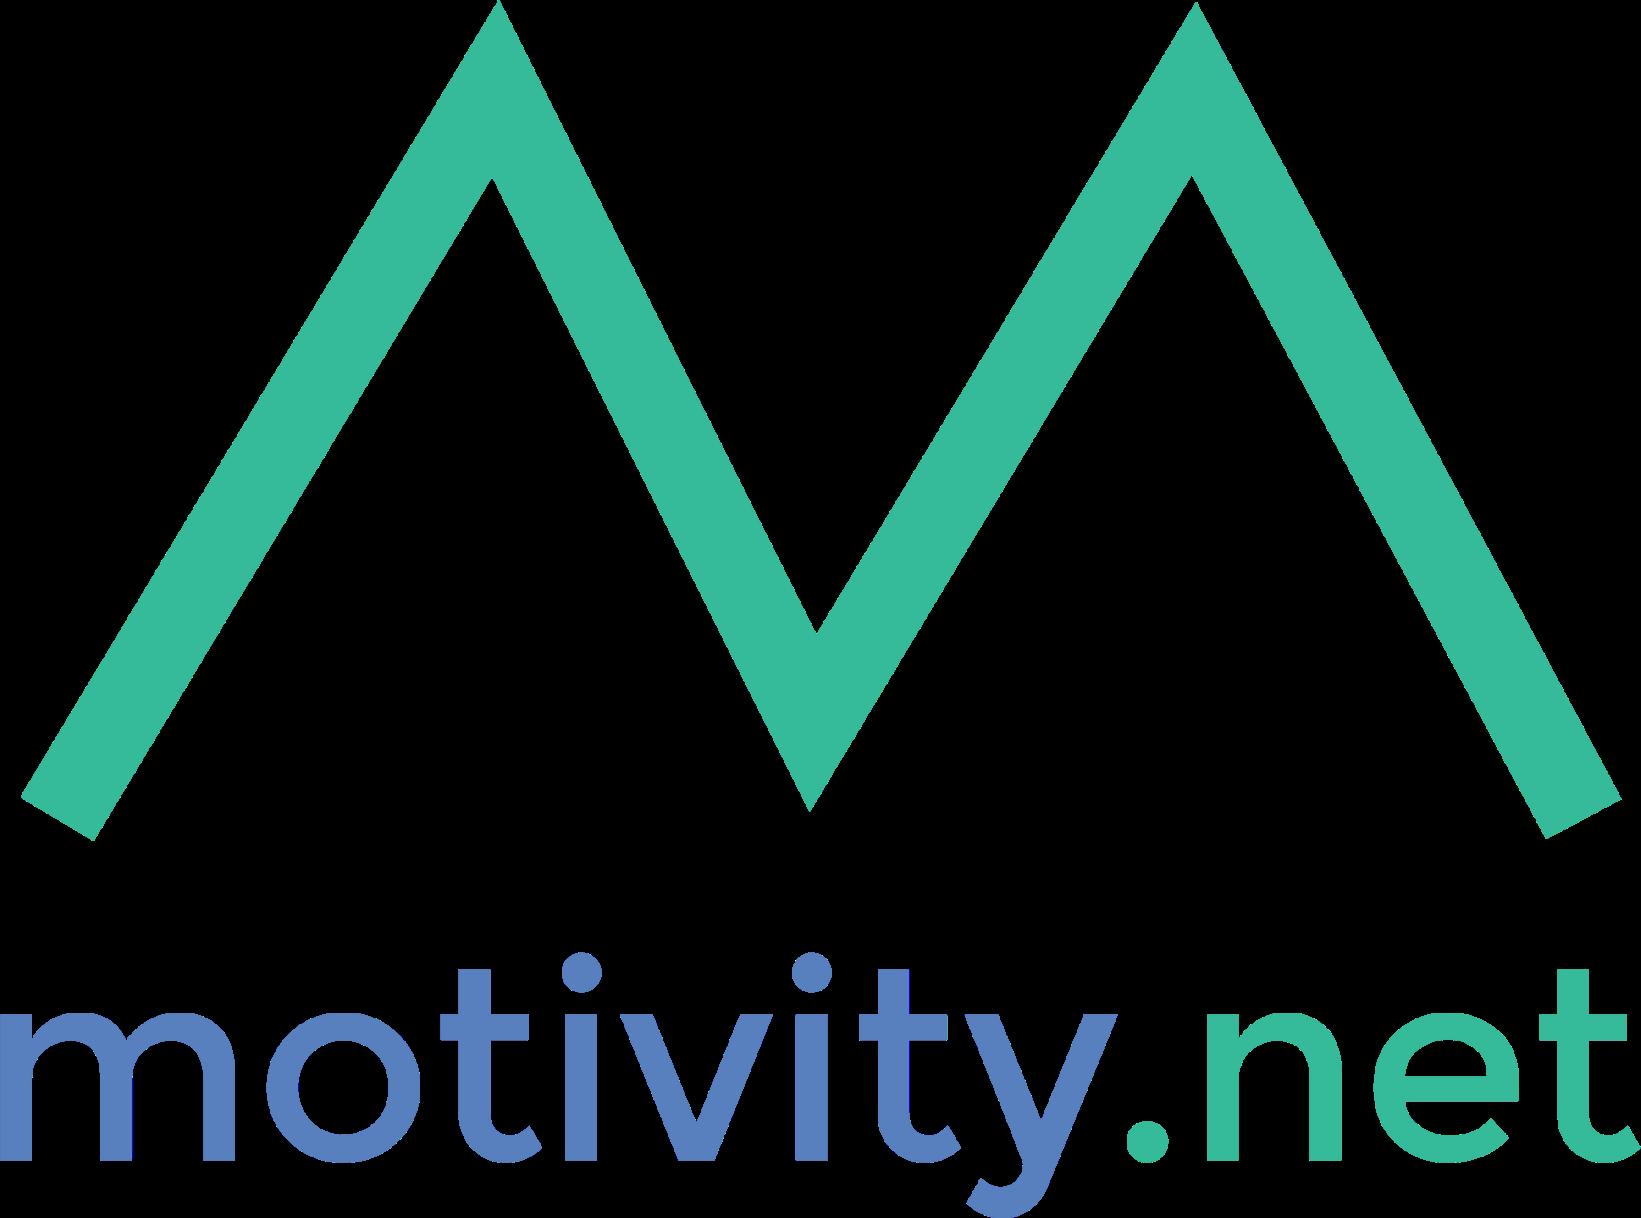 Motivity.net